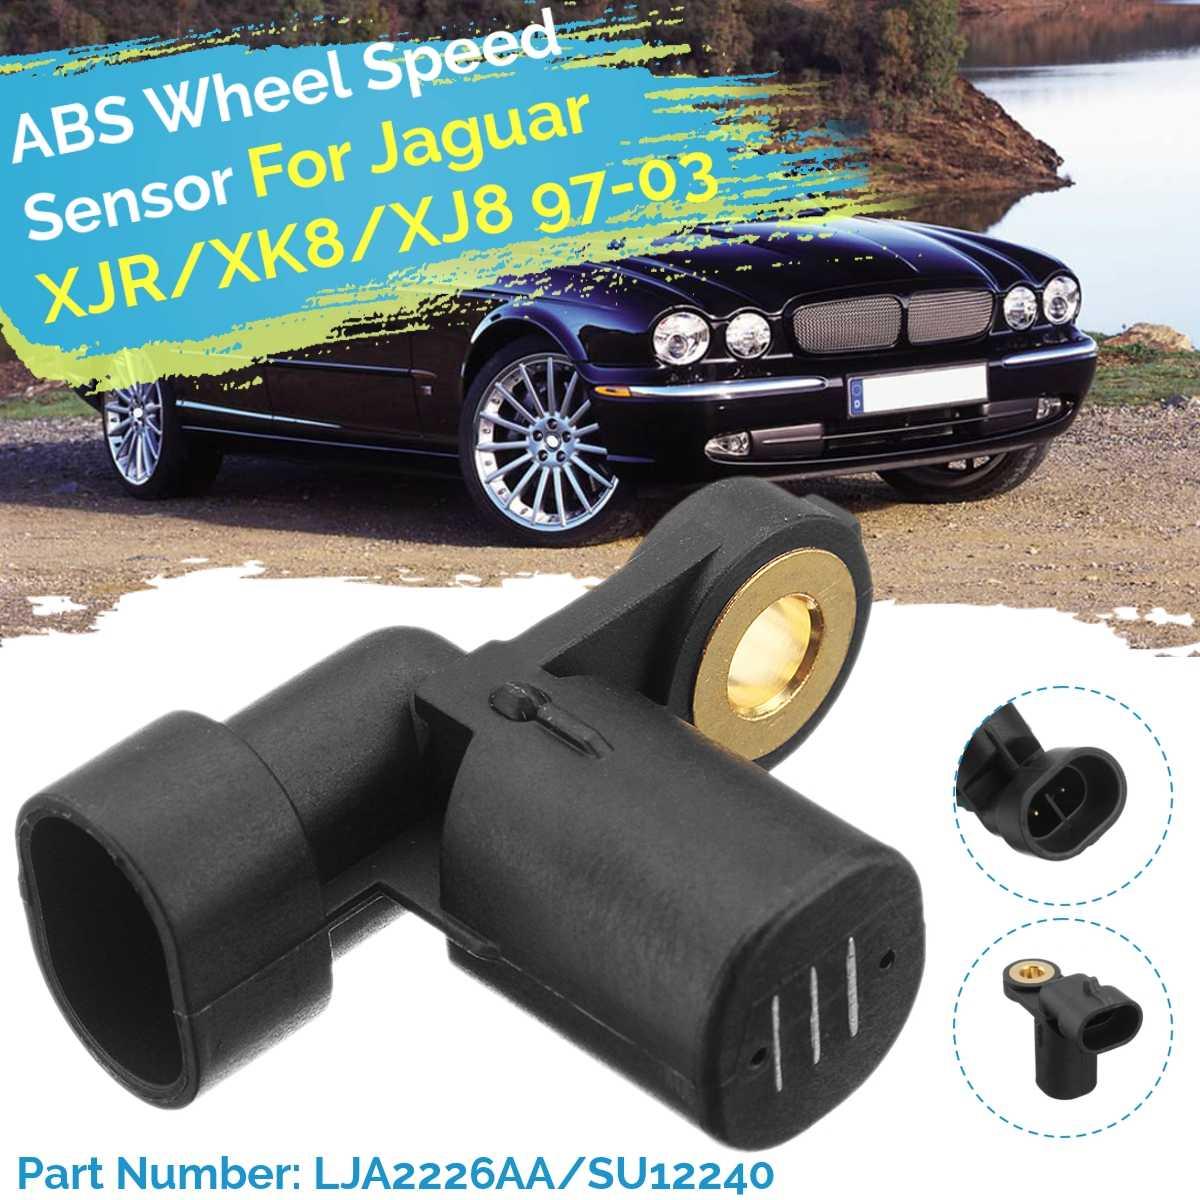 4PCS  Front /& Rear Left /& Right ABS Wheel Speed Sensor for 2008 Jaguar XJR XKR